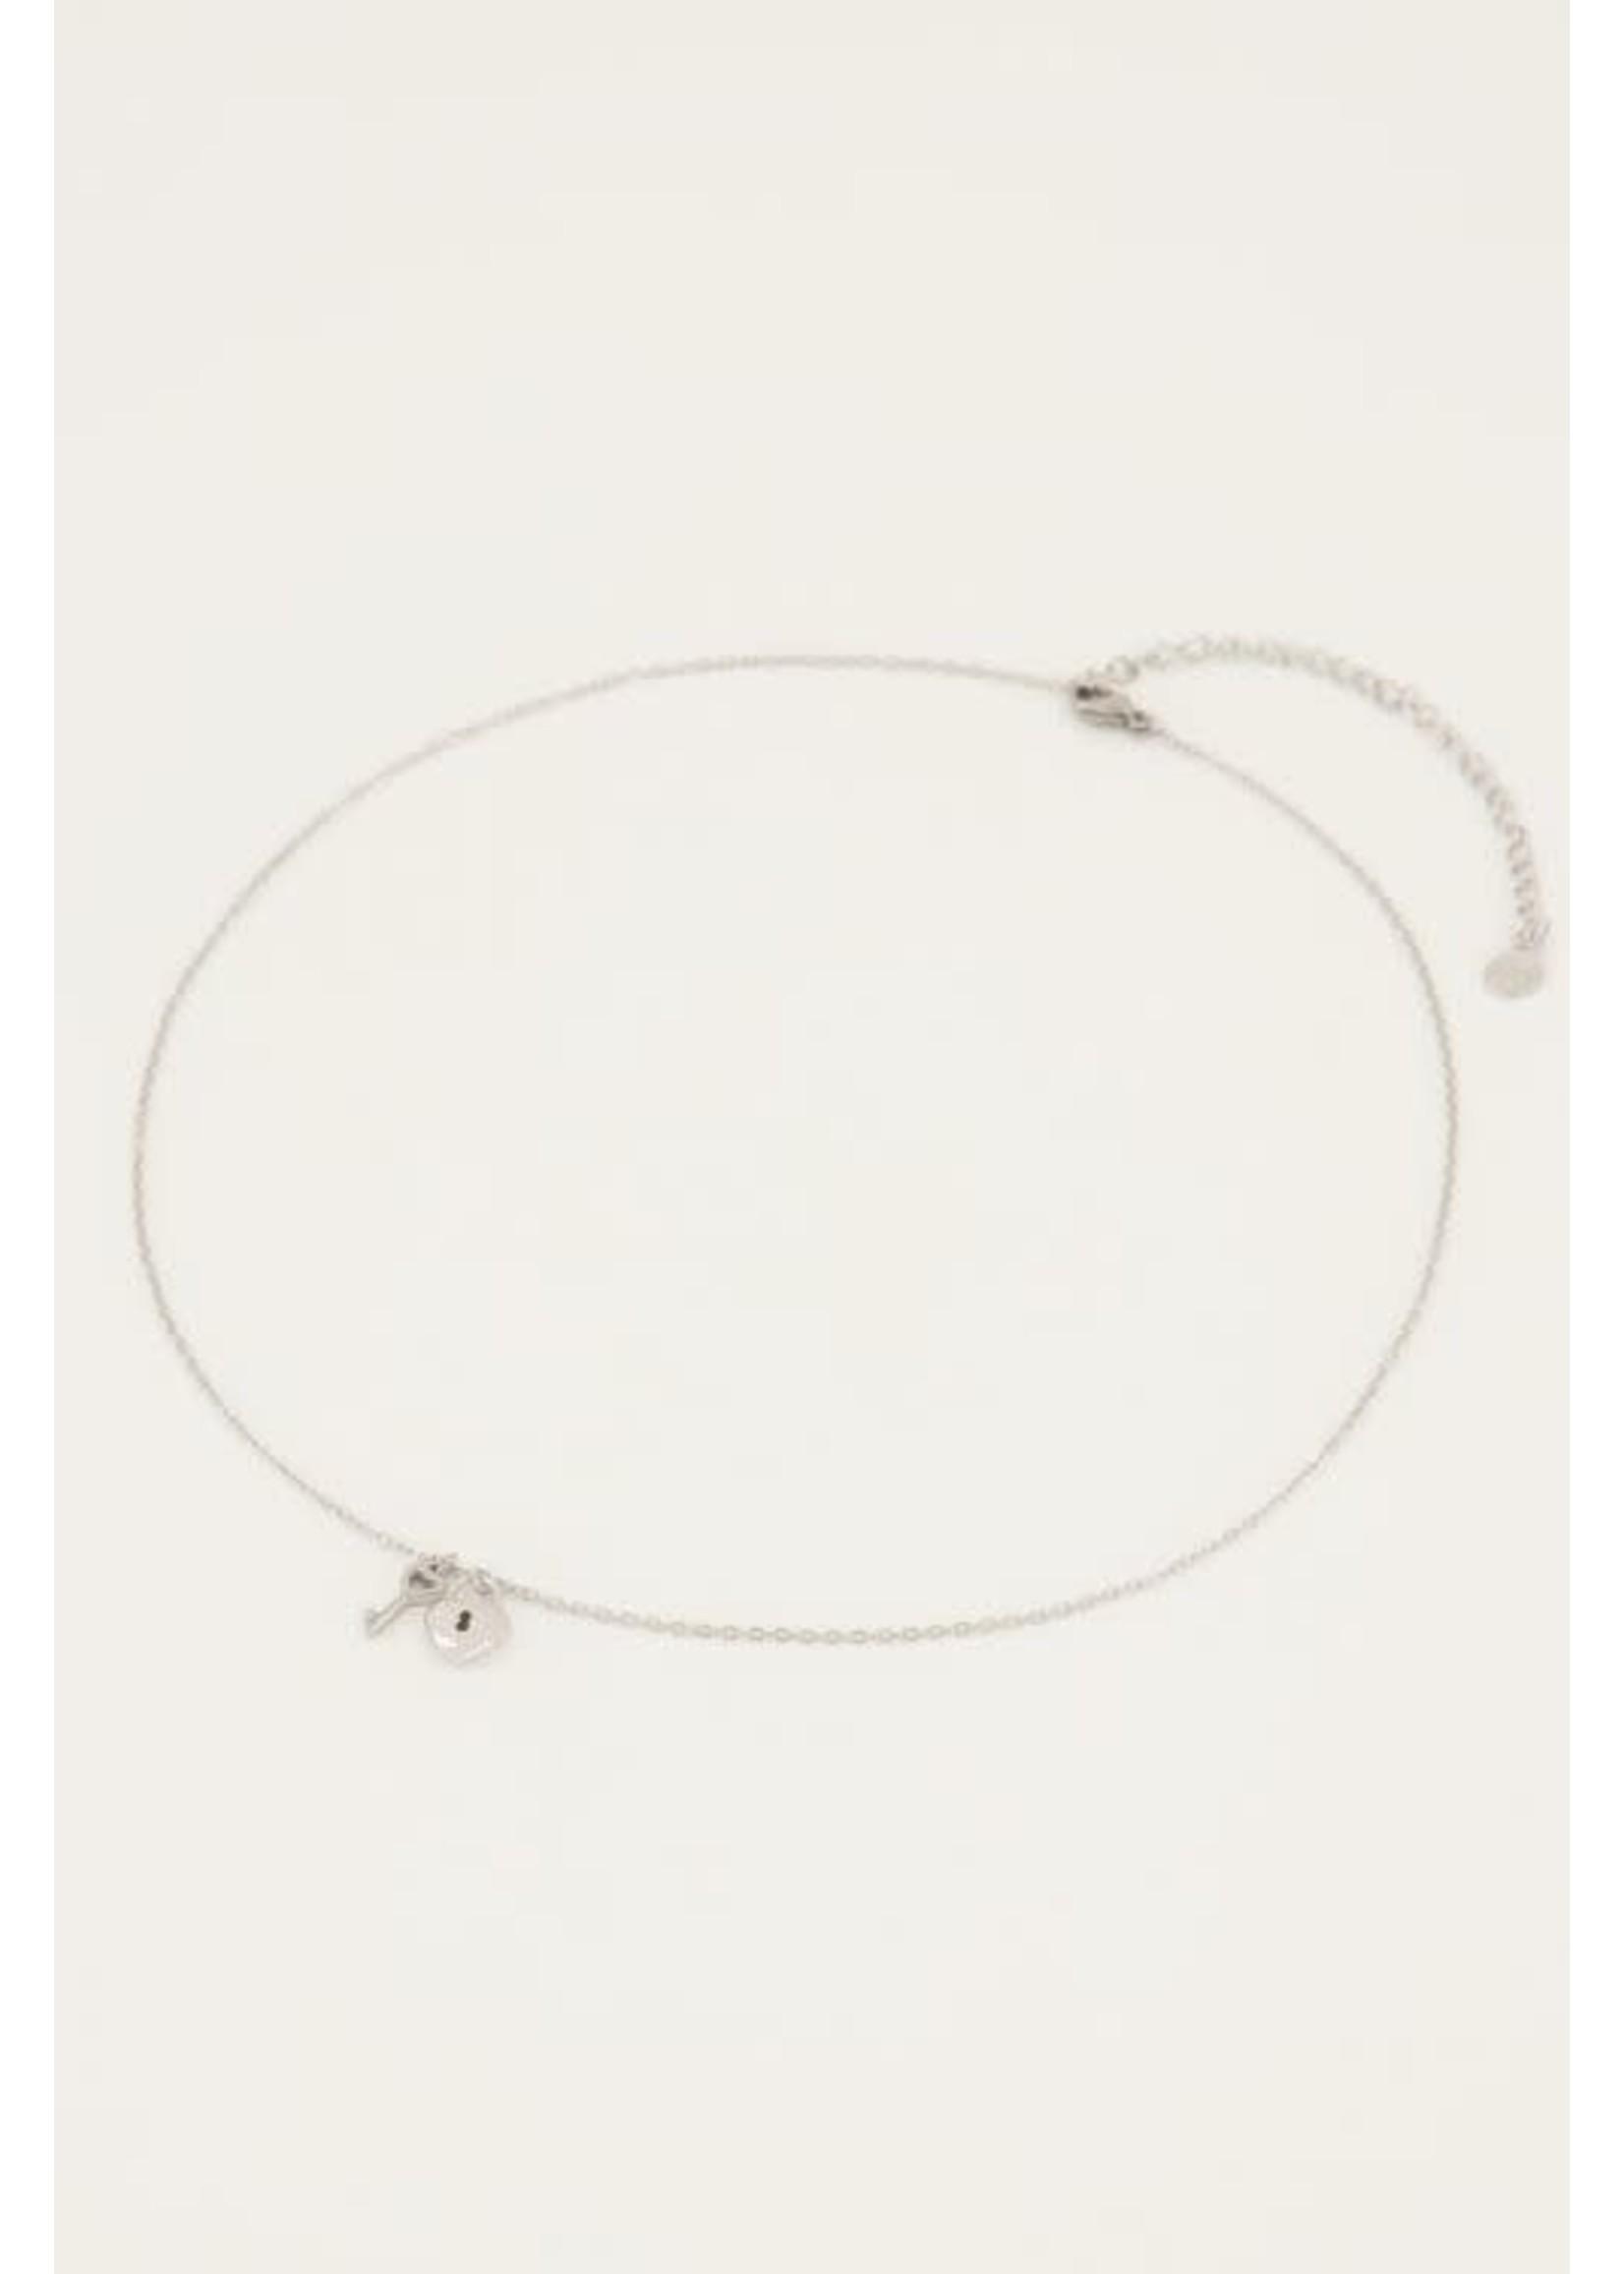 My Jewellery Ketting hartjes slot & sleutel